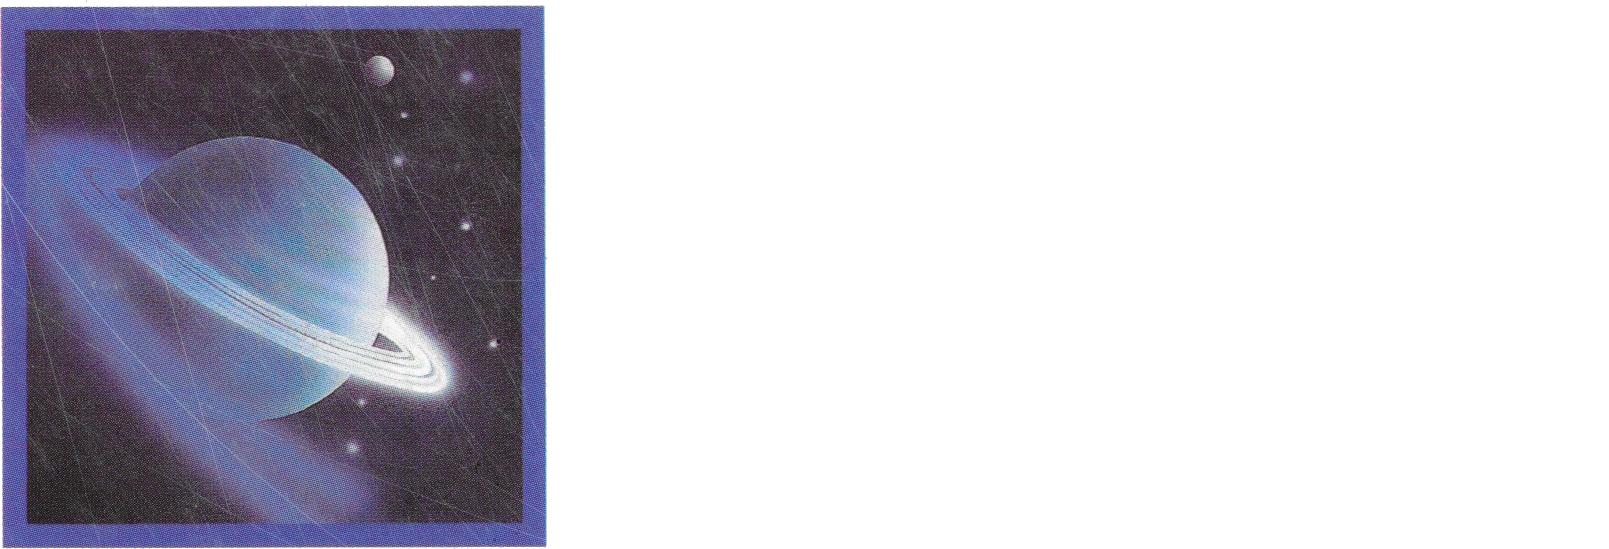 Owens & Co